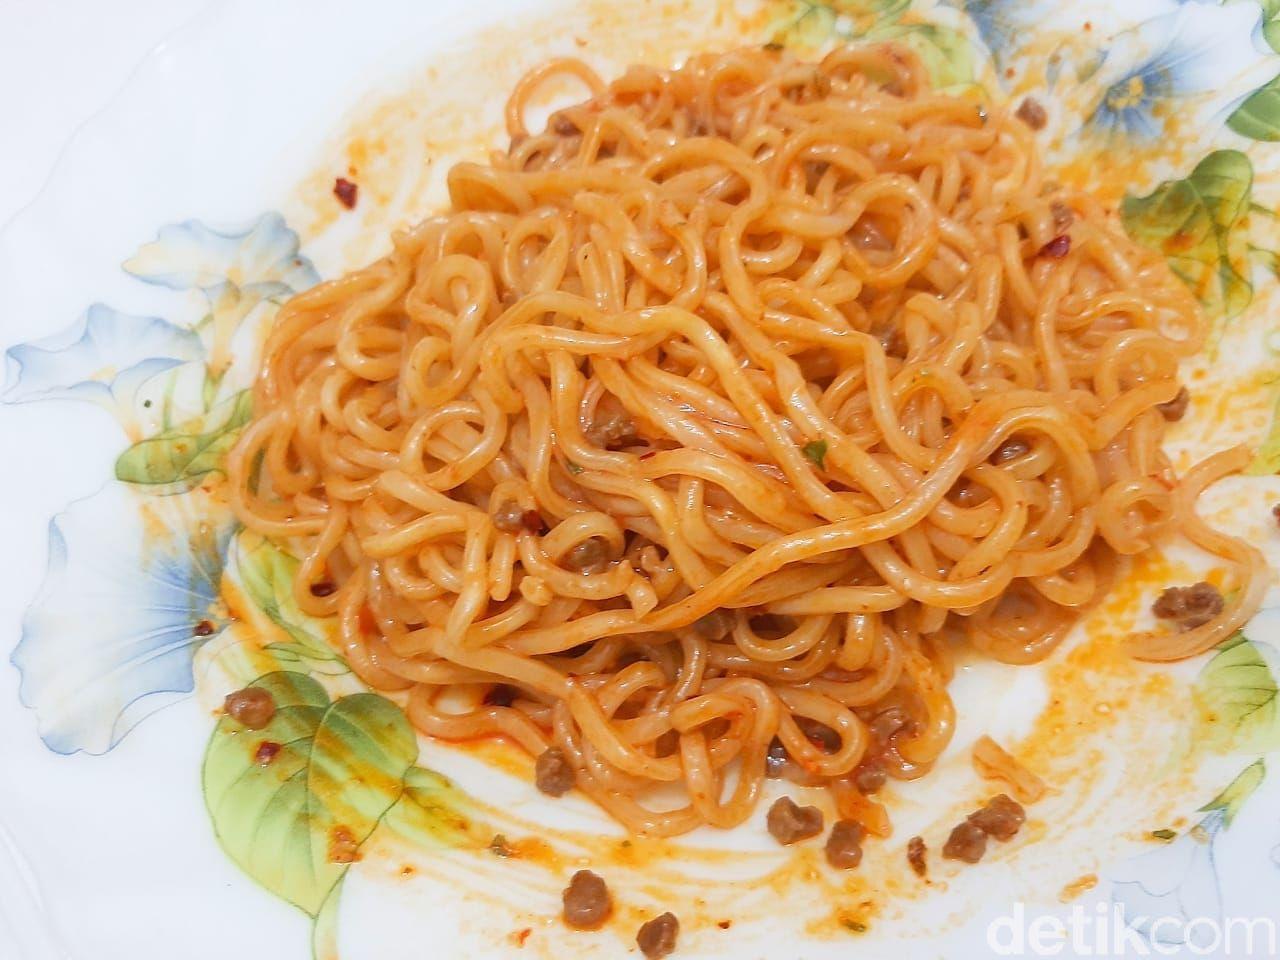 indomie mieghetti rasa spaghetti bolognese